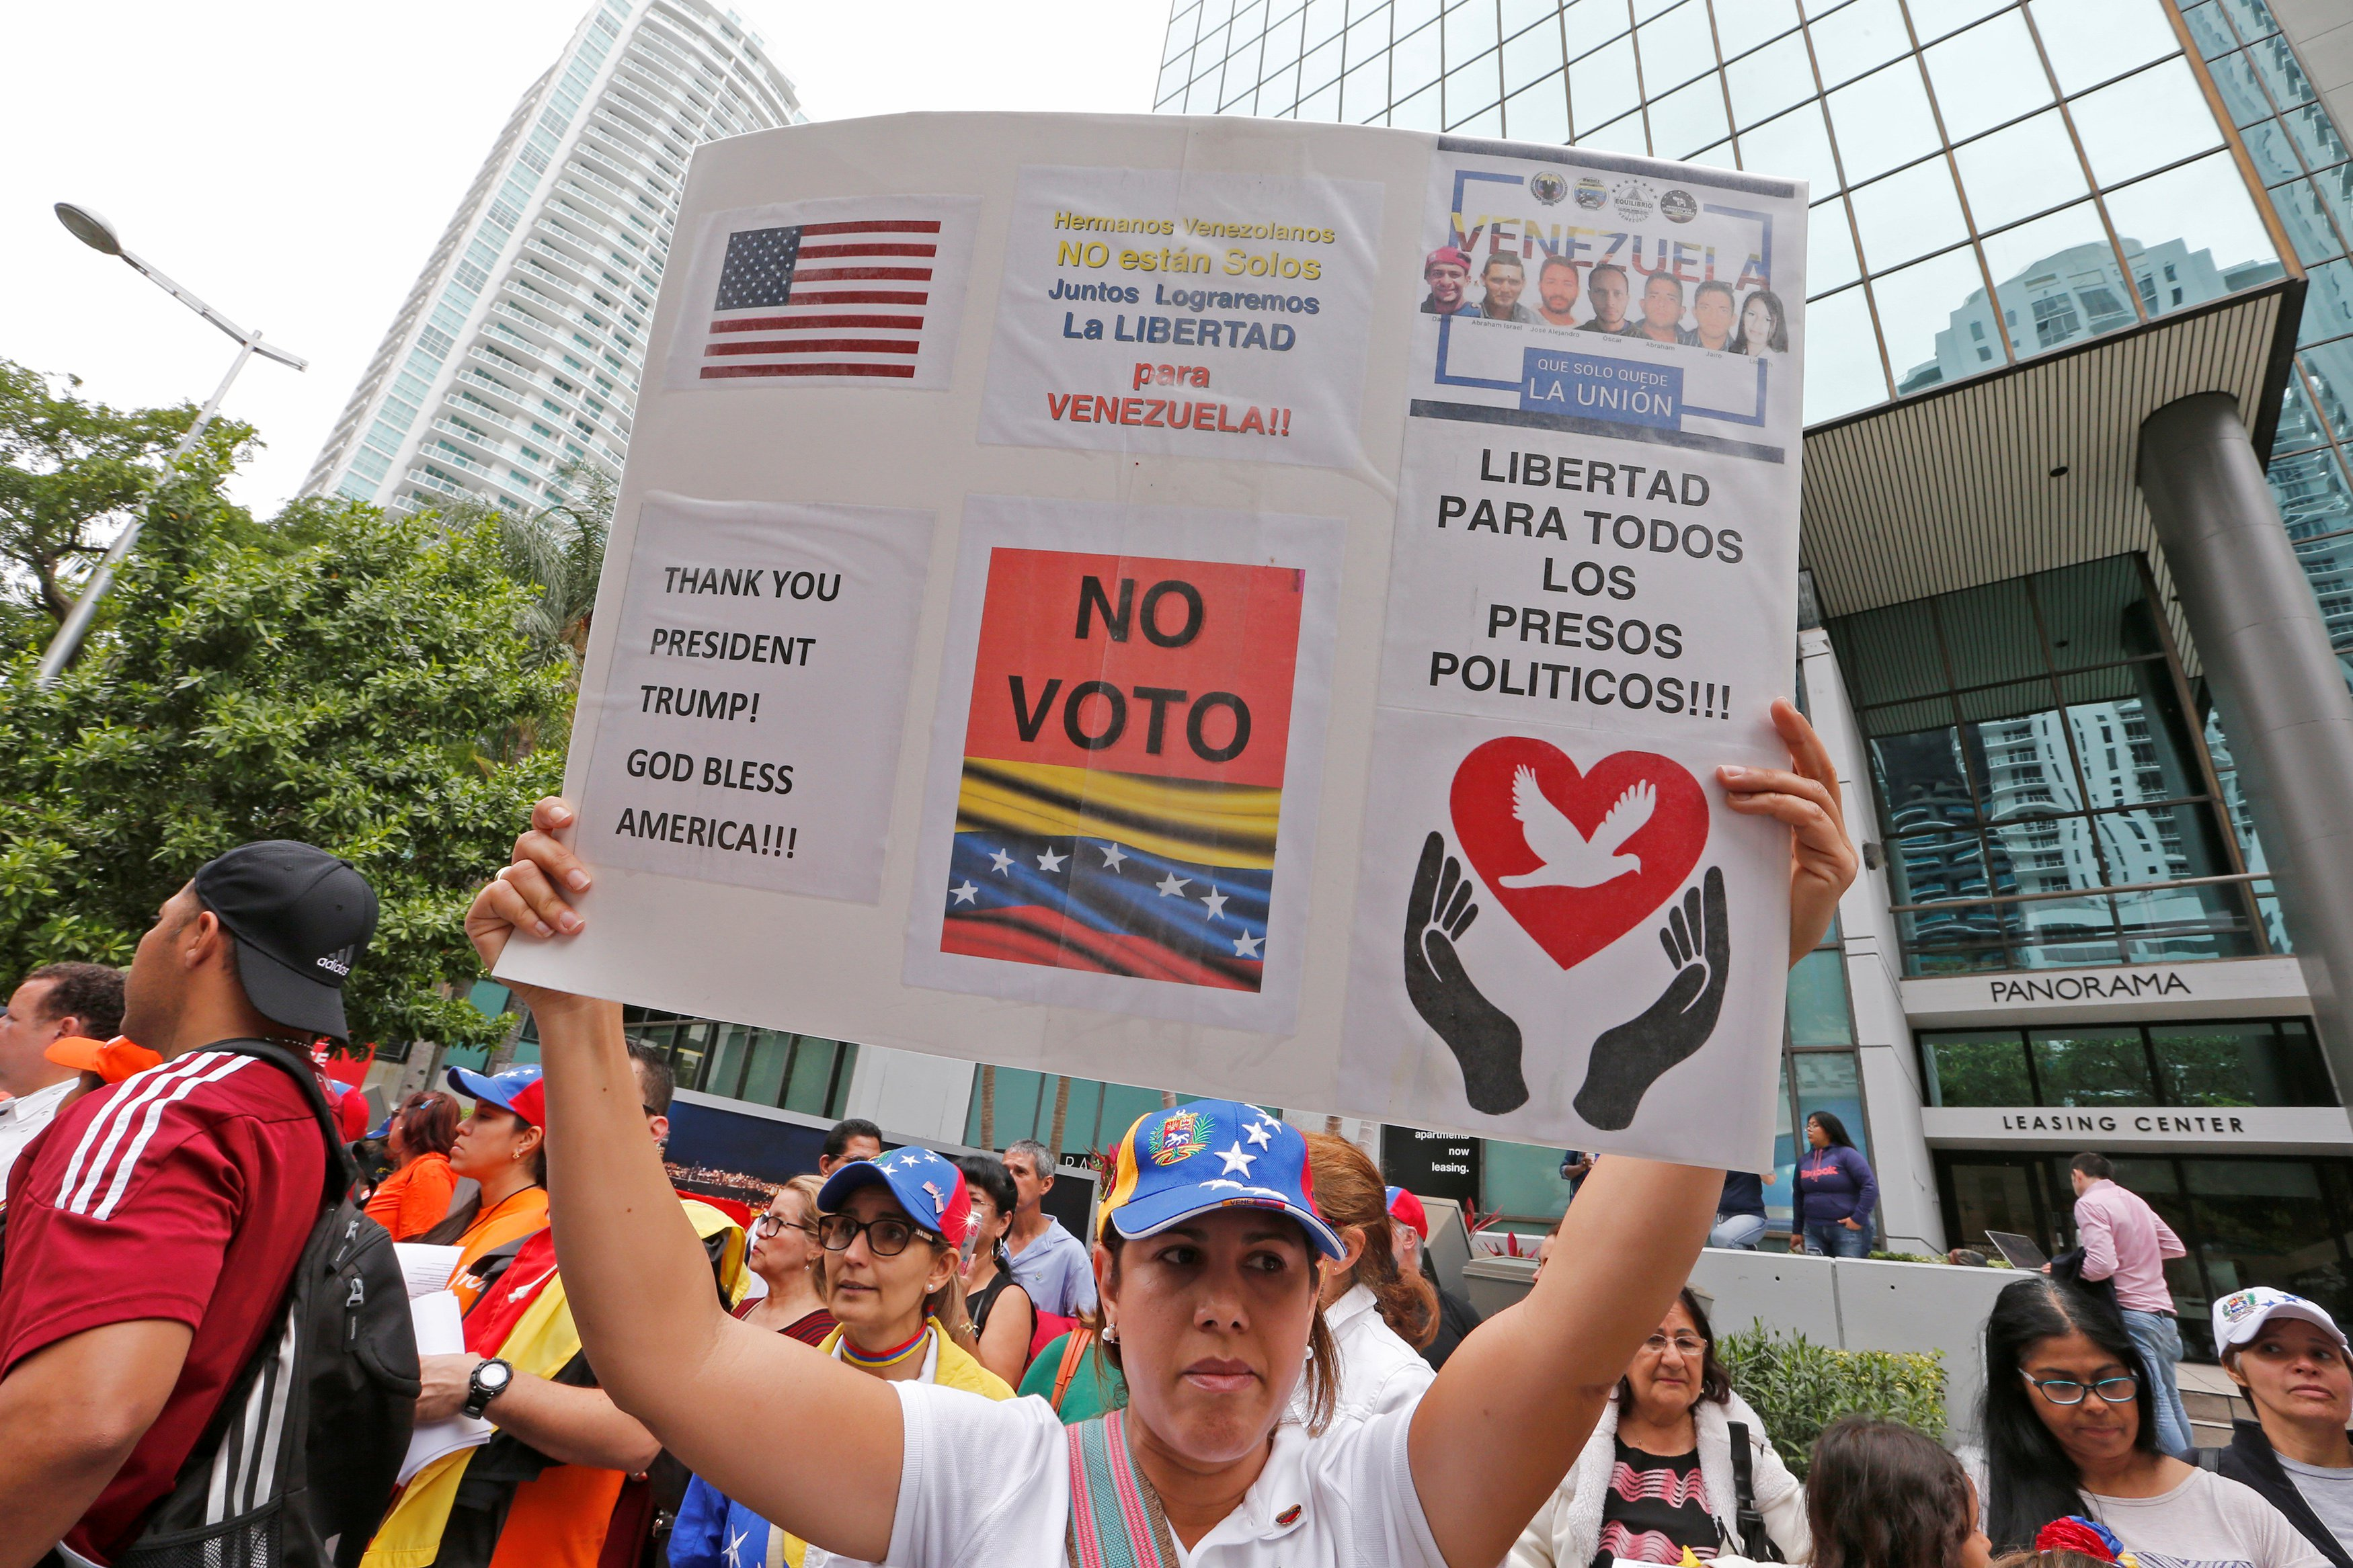 Venezuelans protest the presidential election in Venezuela outside the Venezuelan consulate where some Venezuelans cast their votes in the presidential election in Miami, Florida, U.S., May 20, 2018.  REUTERS/Joe Skipper